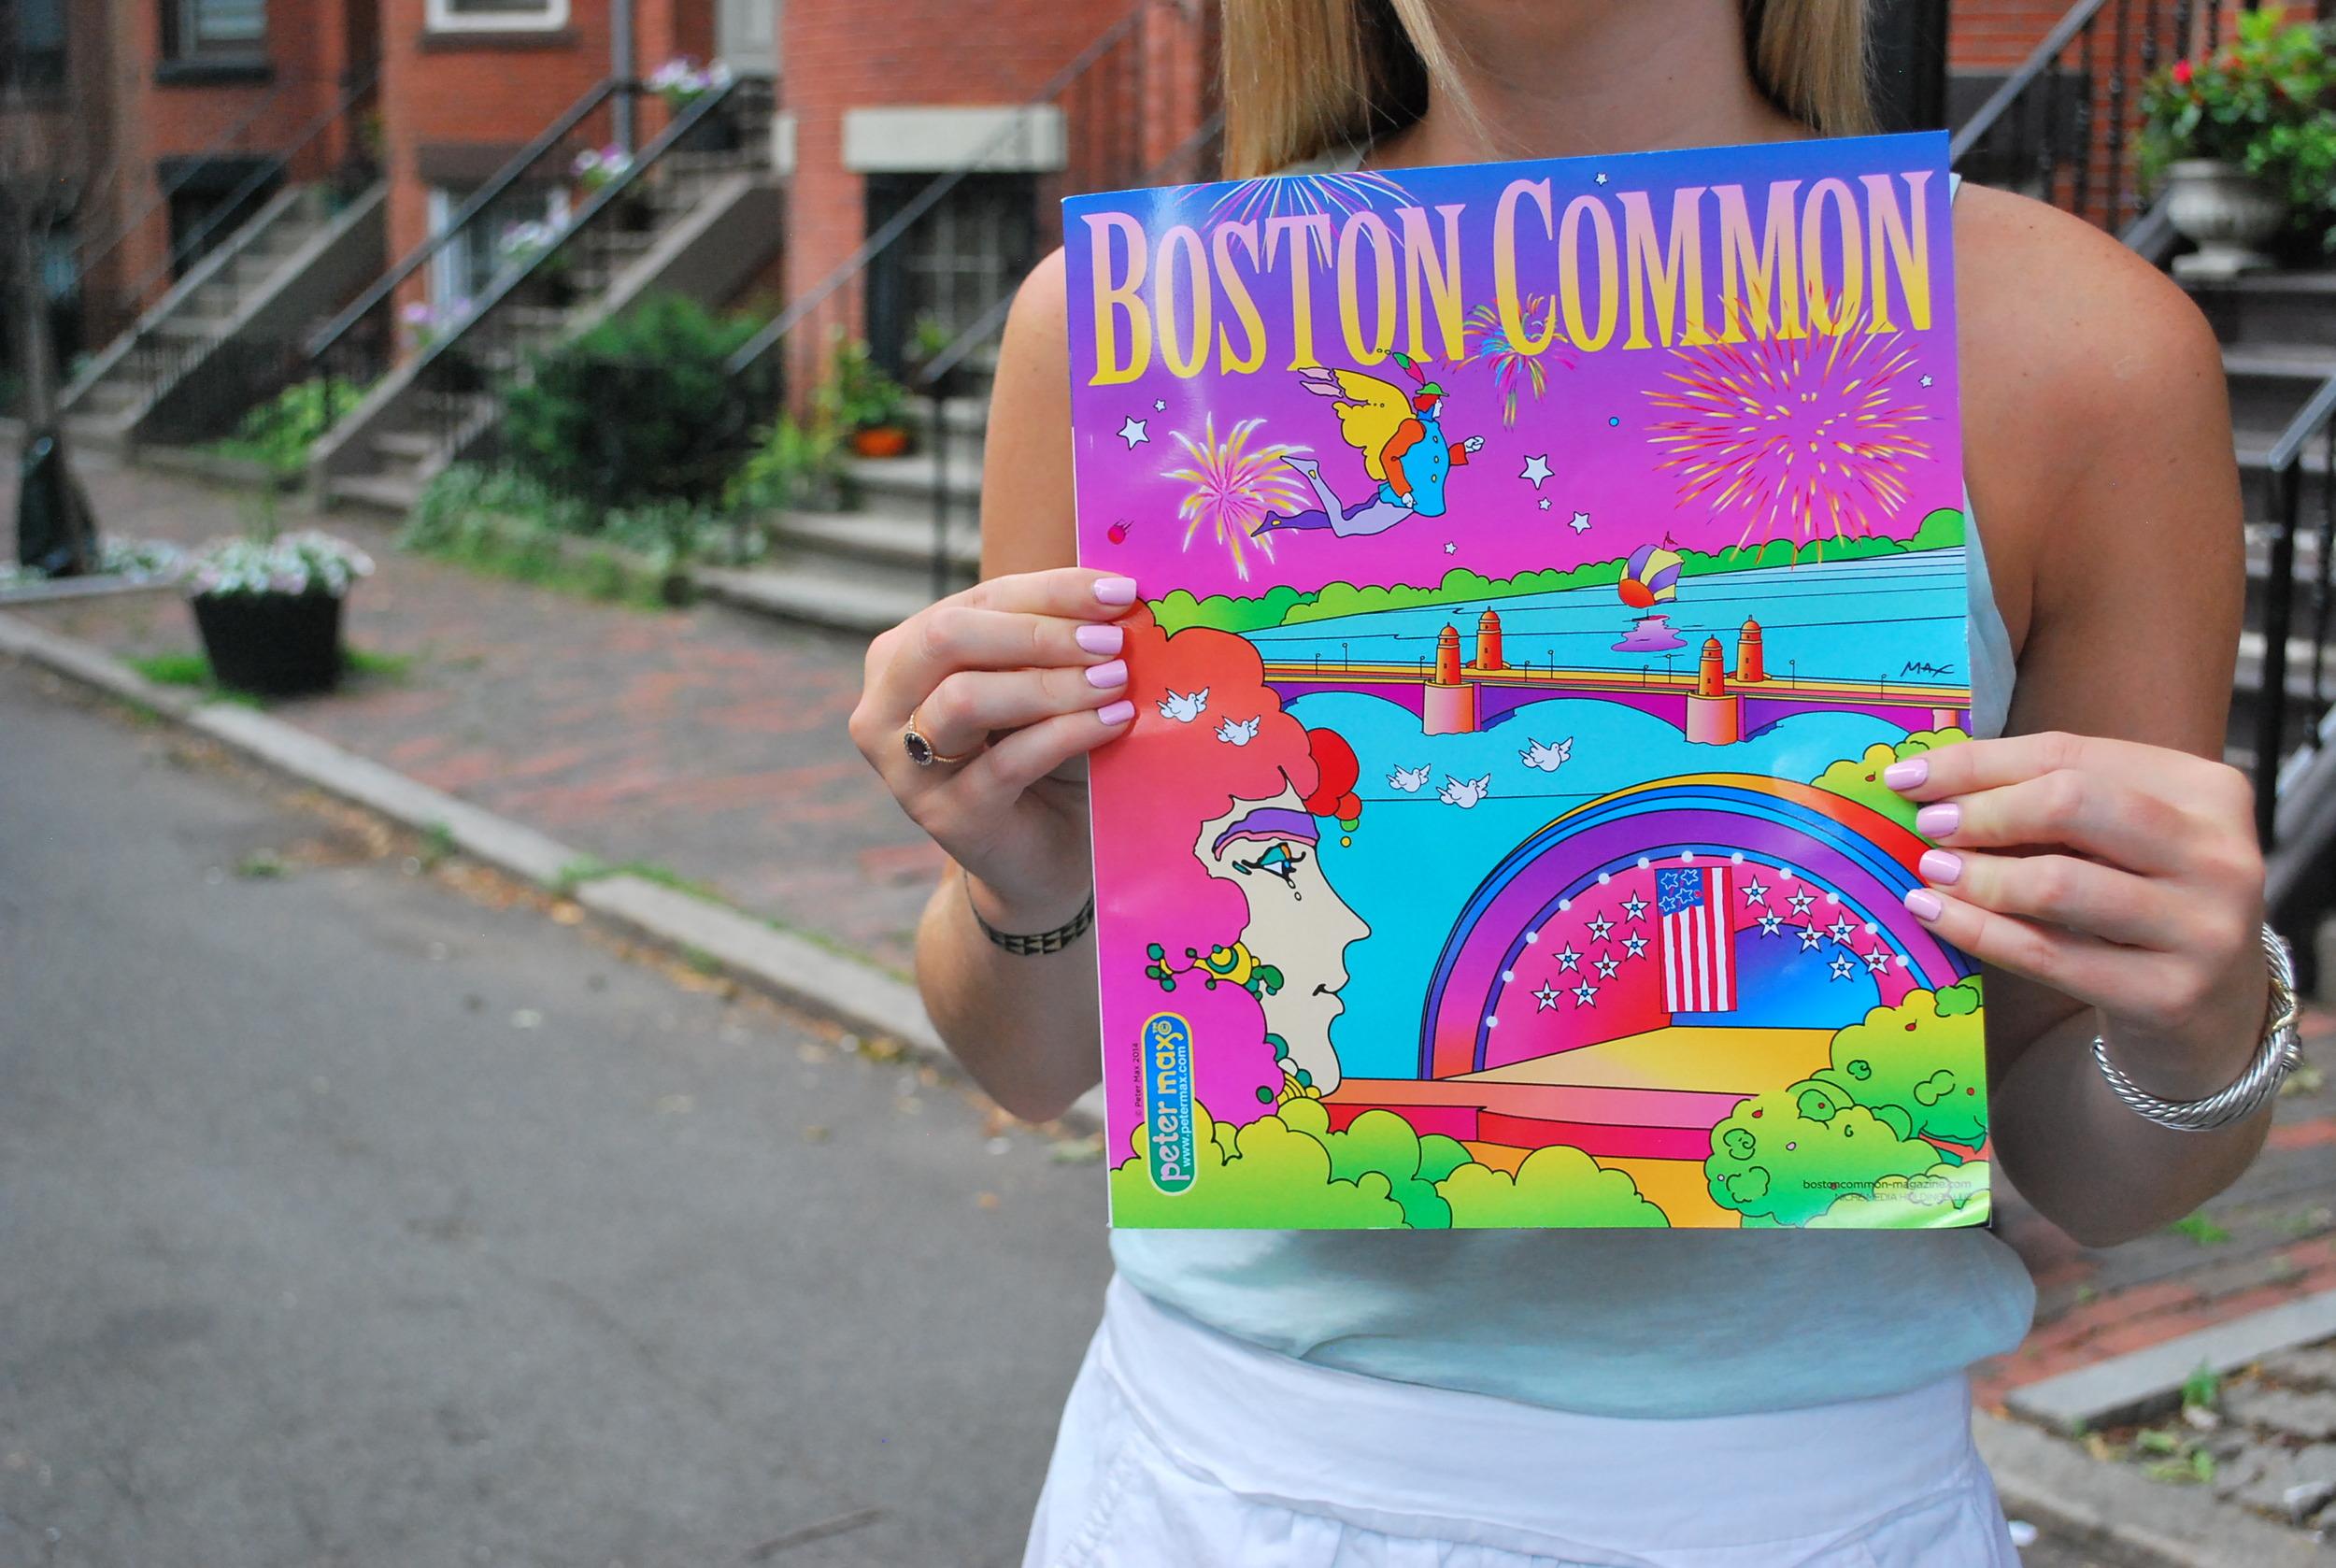 bash-studio-boston-common-peter-max-summer-2014.jpg